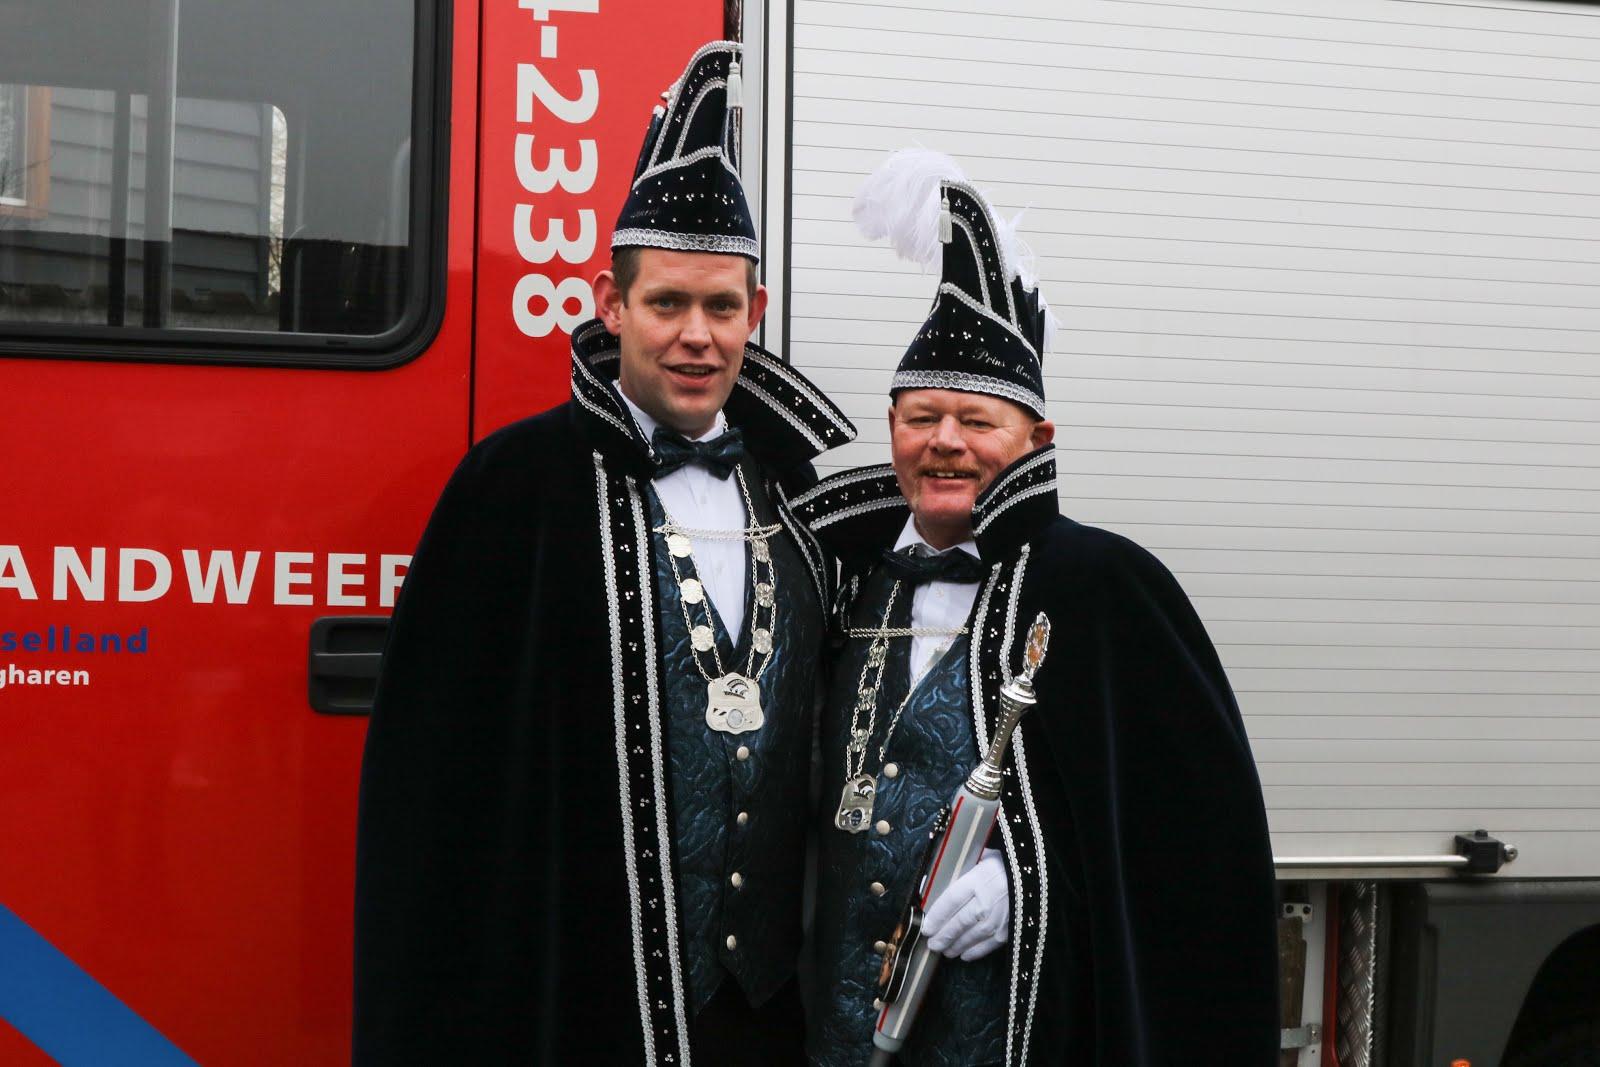 Prins Marinus 1e en Adjudant Stef 2017 / 2018: